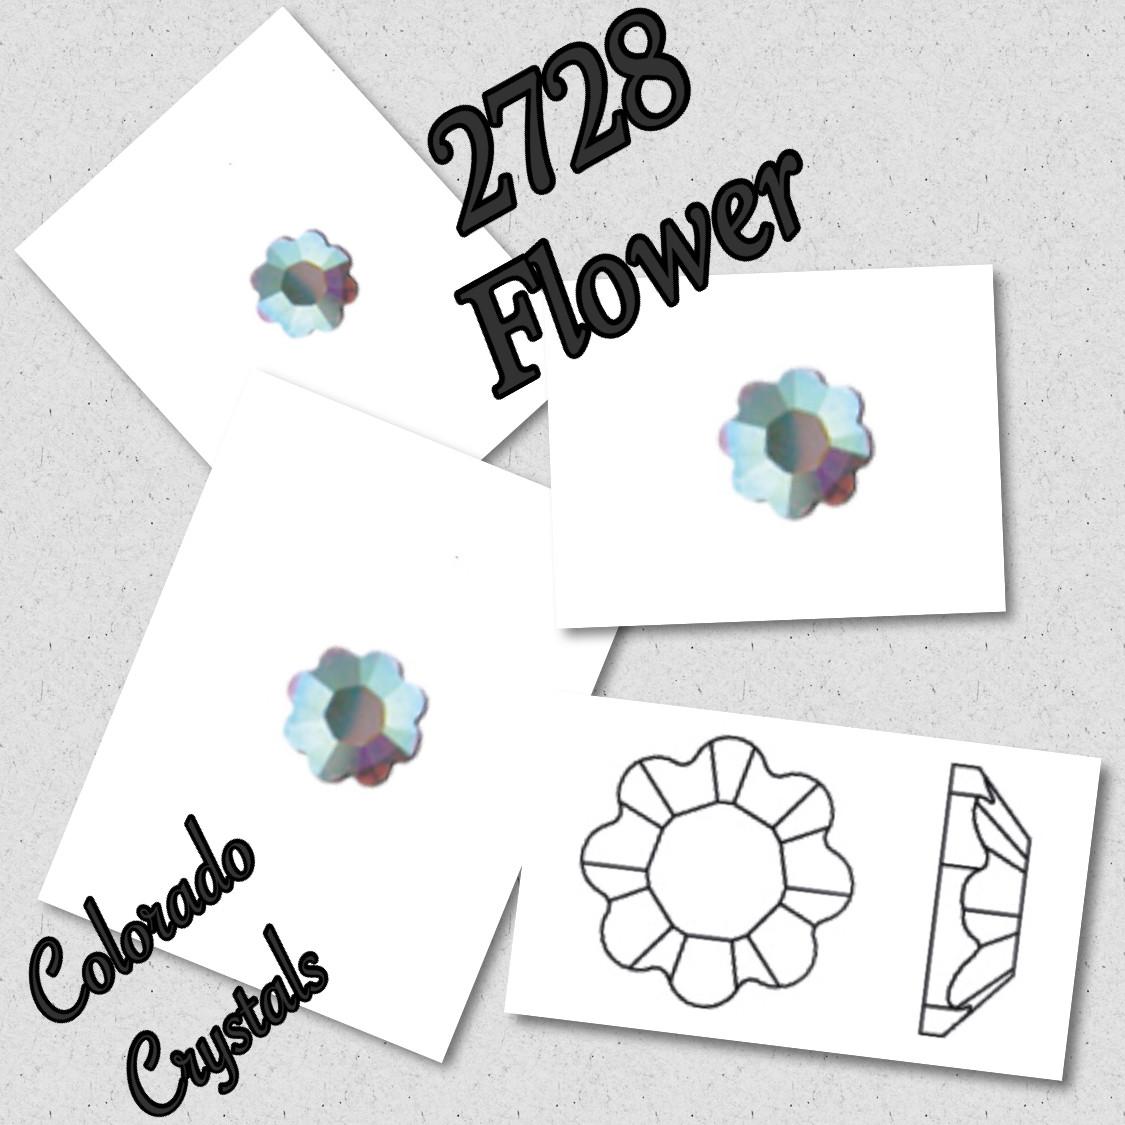 2728 Flower - Crystal AB - Swarovski Fancy Flatback 10ss LIMITED